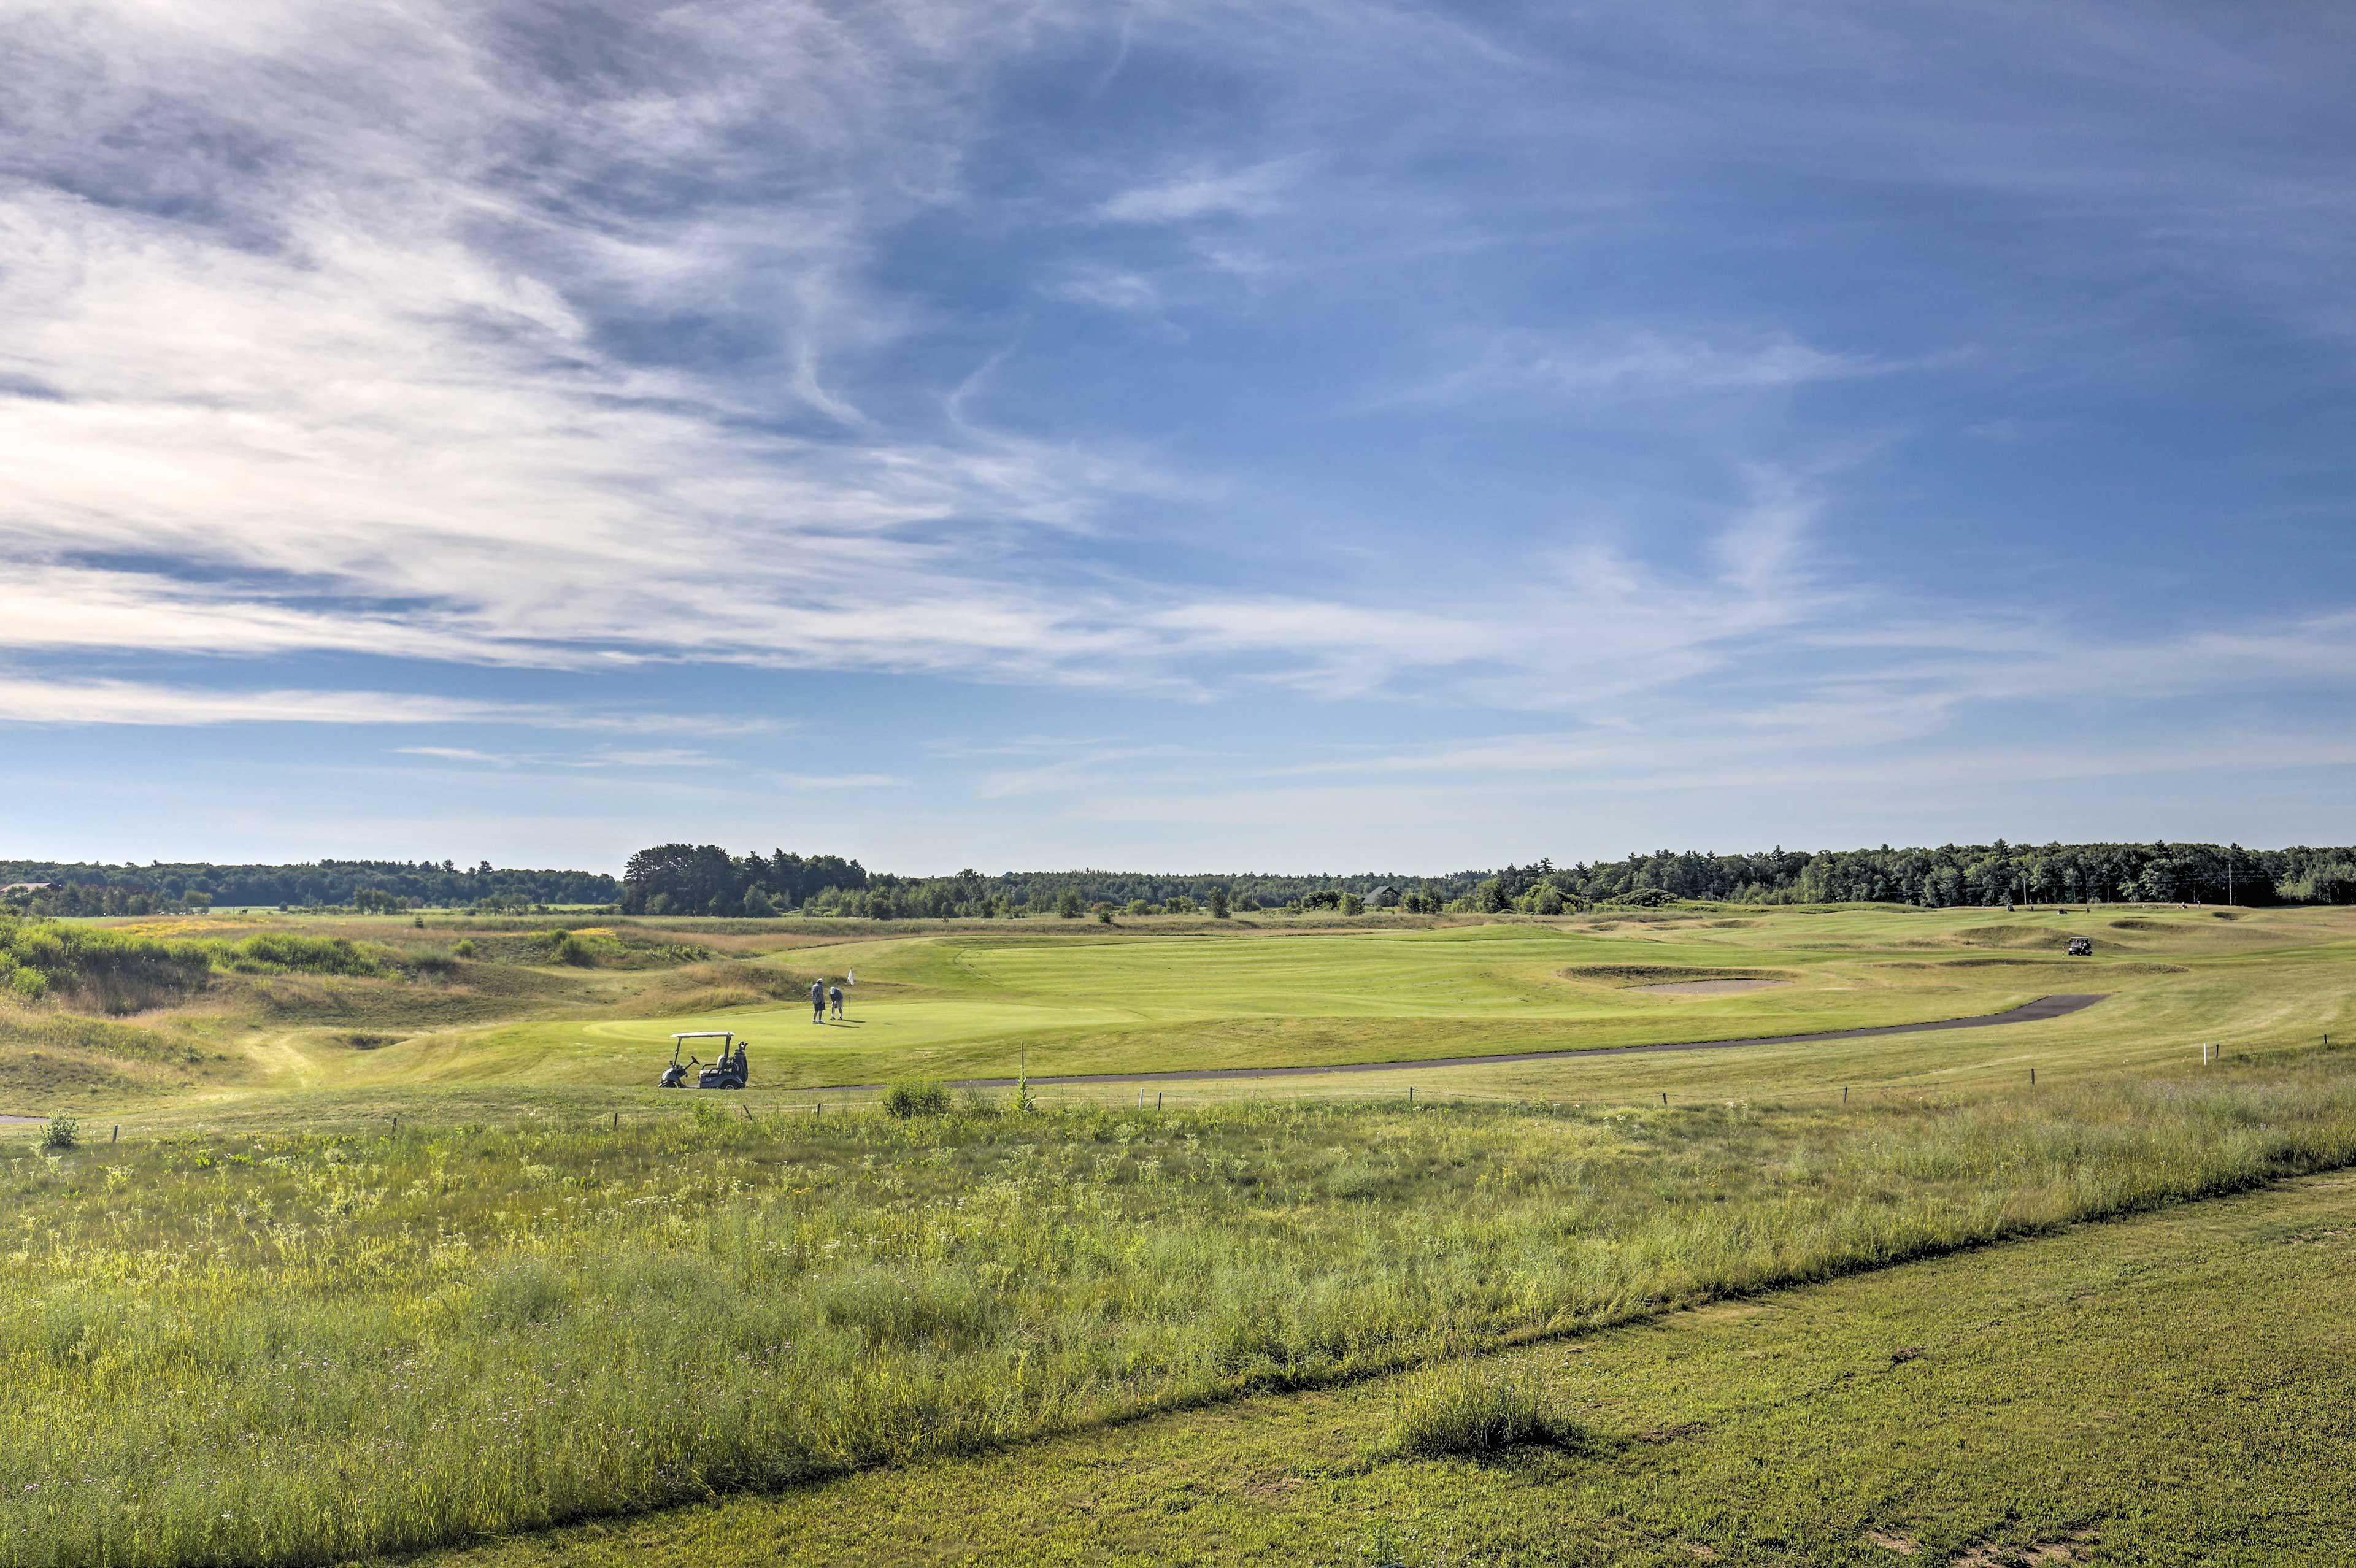 Enjoy views of the the second fairway of Big Fish Golf Club.